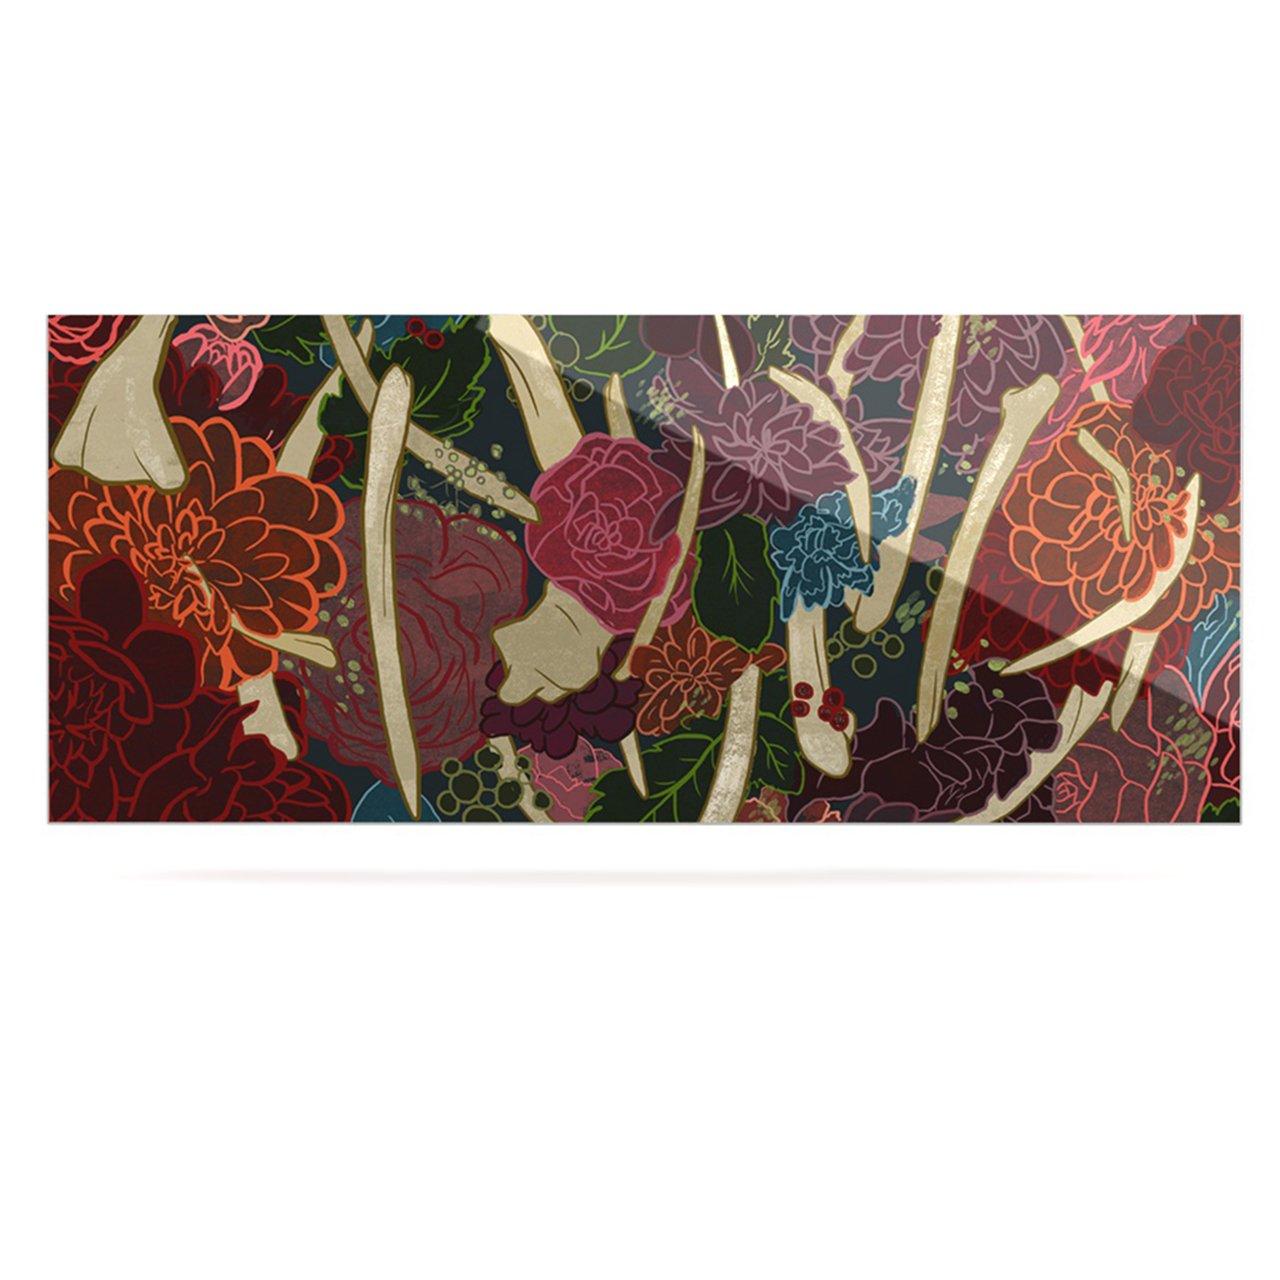 24 x 36 Kess InHouse Jaidyn Erickson New Life Red Flowers Luxe Rectangle Panel